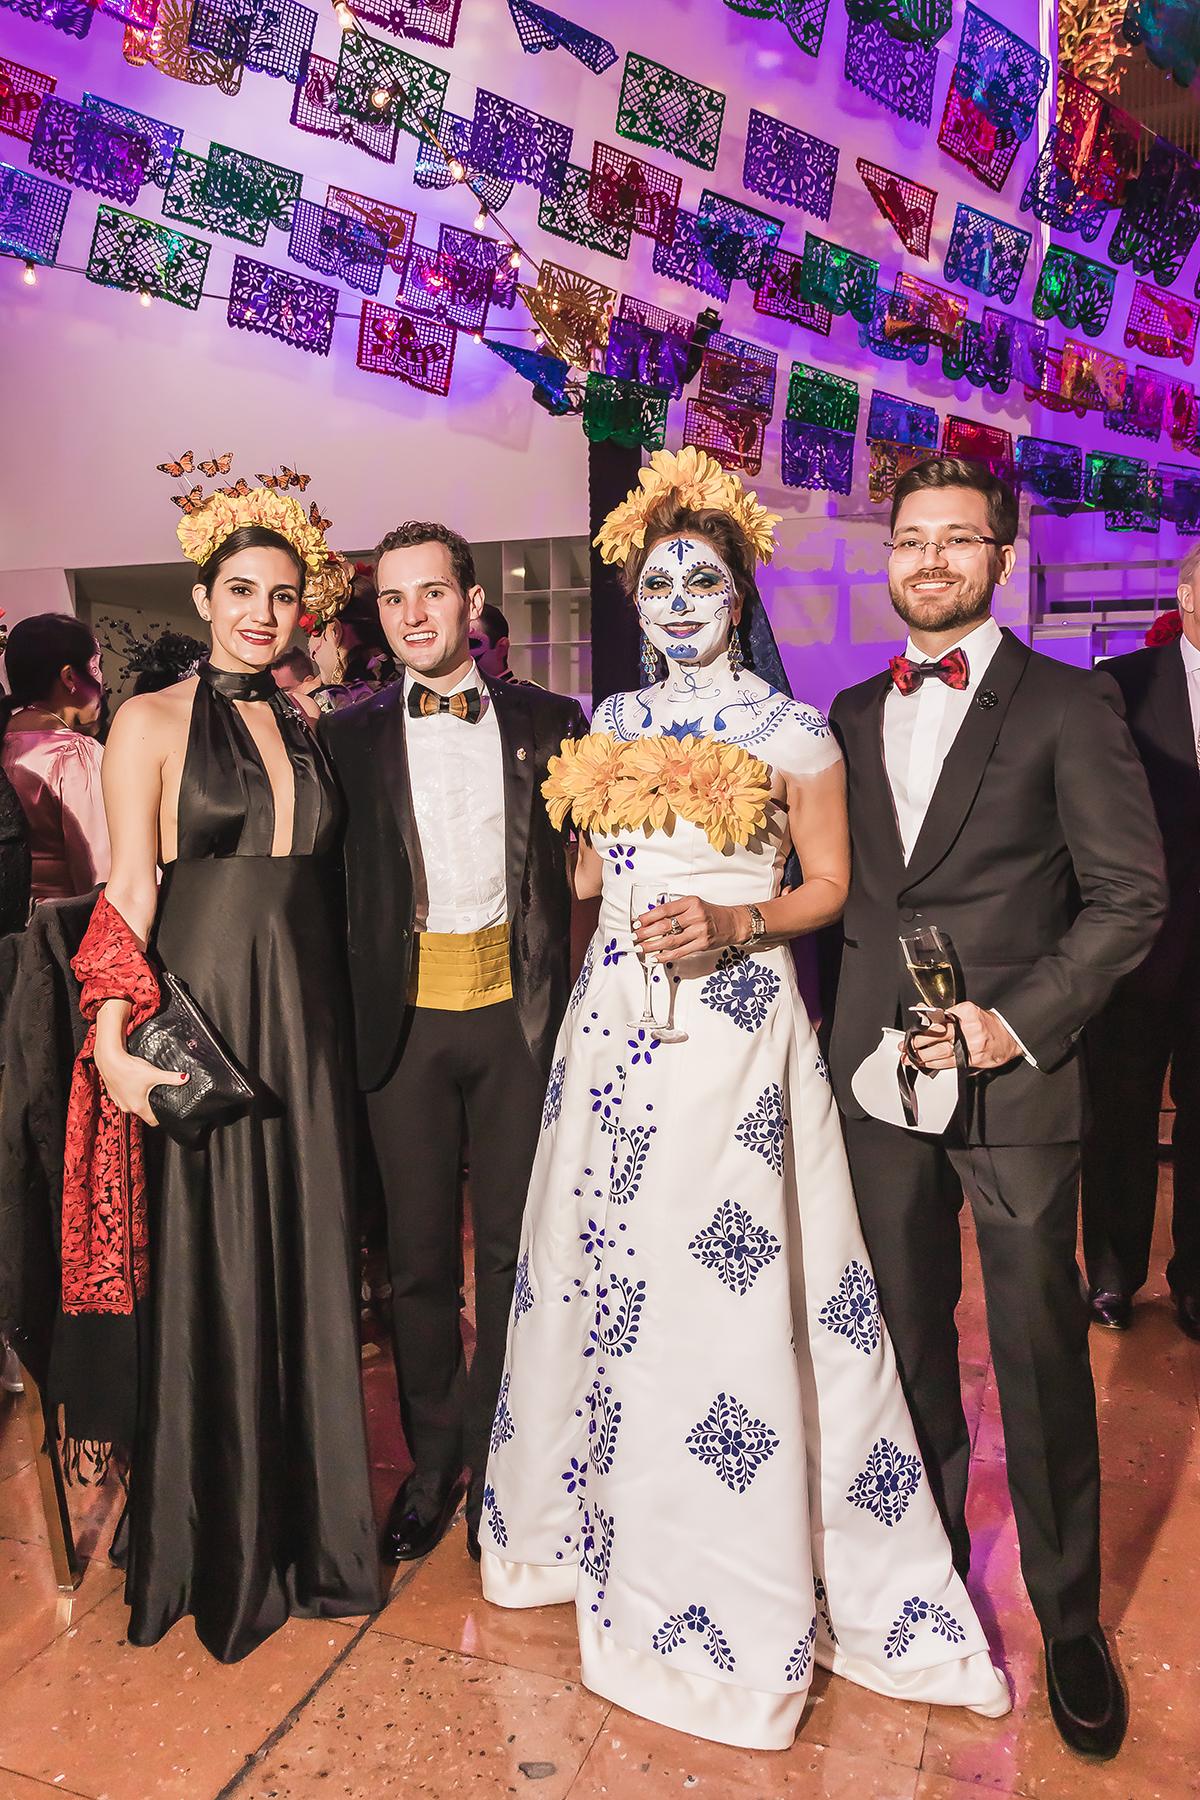 Christina Notzon Jafar, Hunter Henke, Margie Vera and Sal Jafar, II